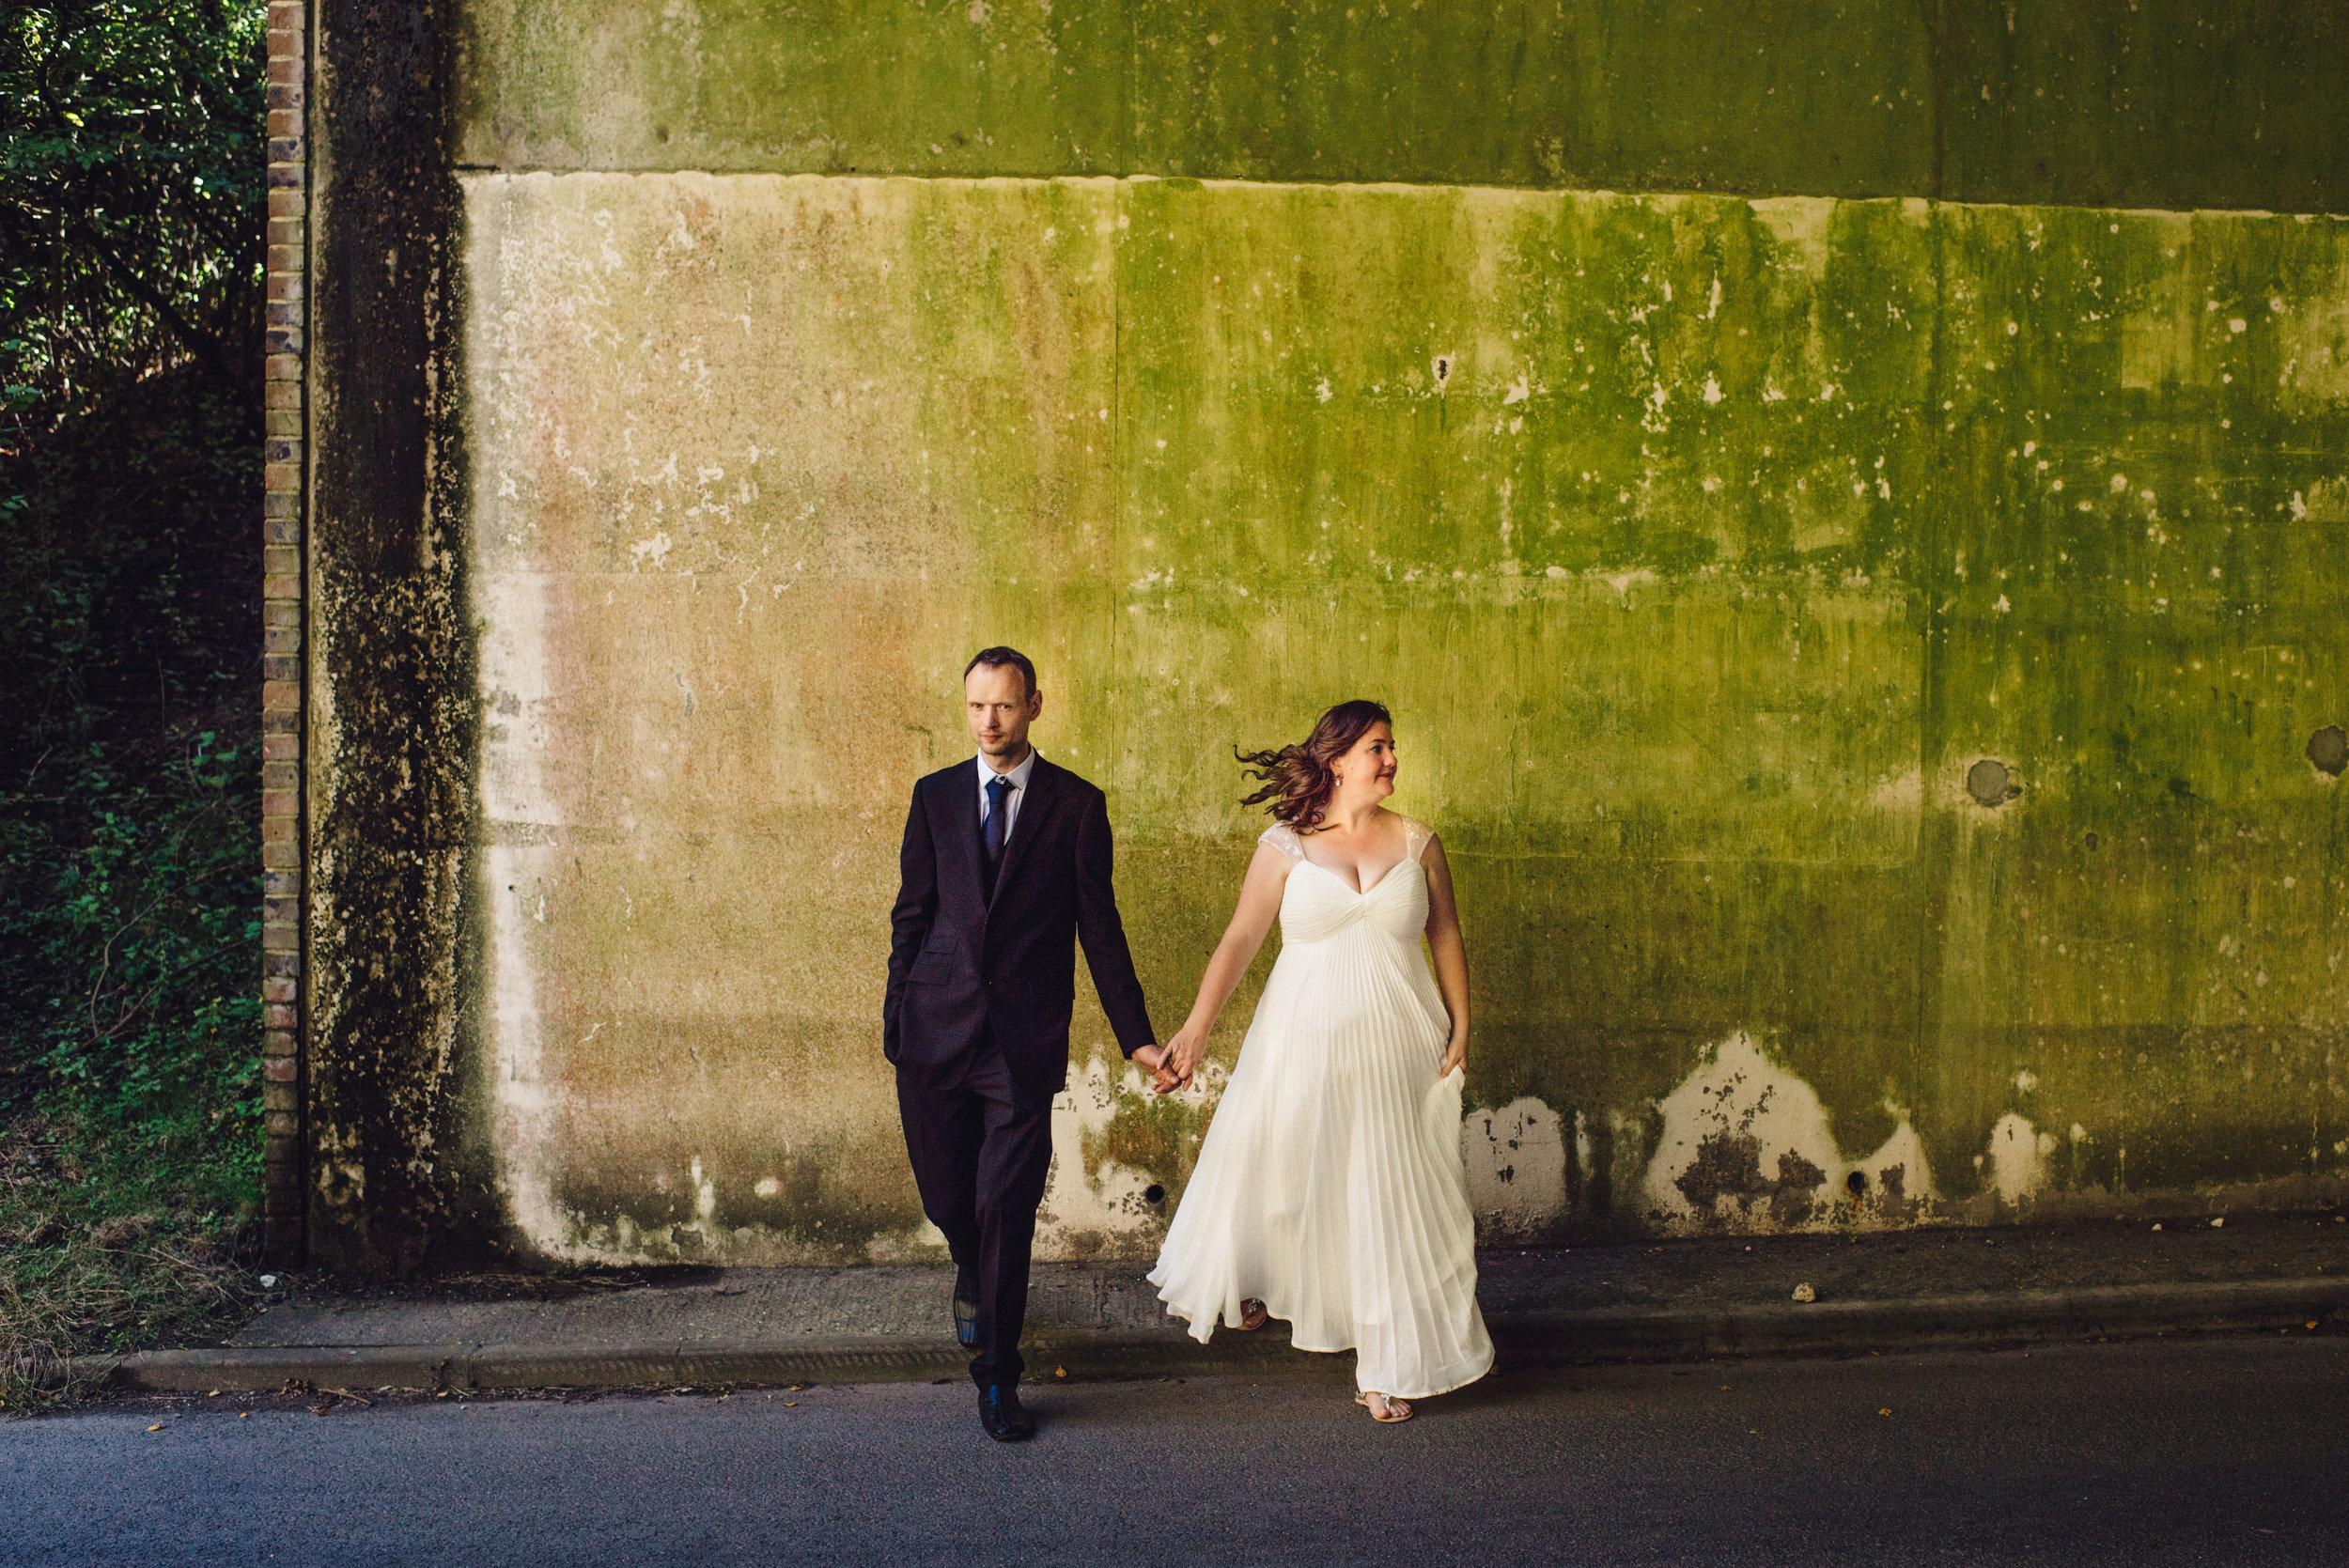 11 HampshirWEdding Photographer Bride Groom Queen Elizabeths County Park Summer Wedding Concrete Wall.jpg